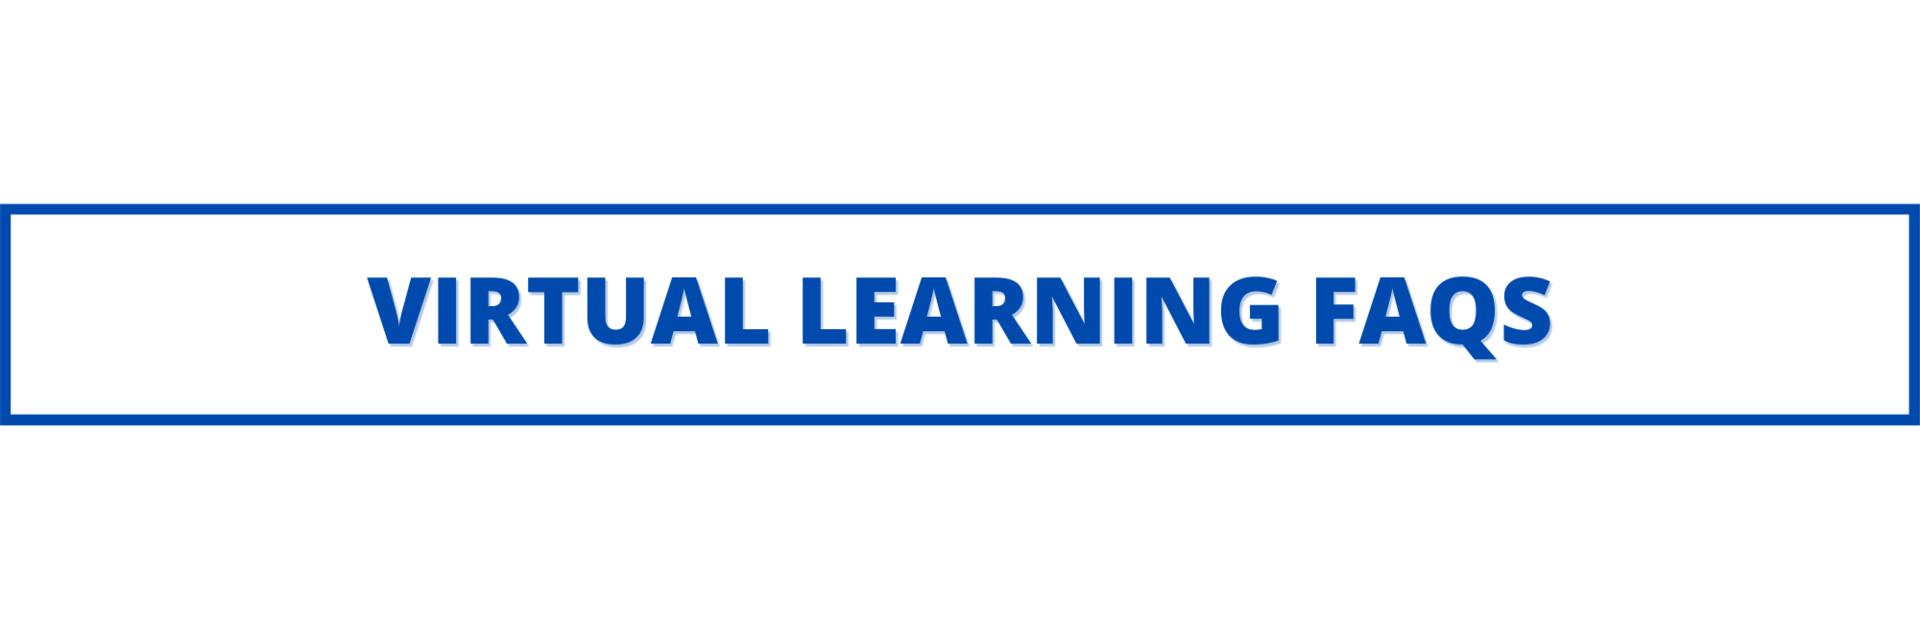 virtual learning faqs